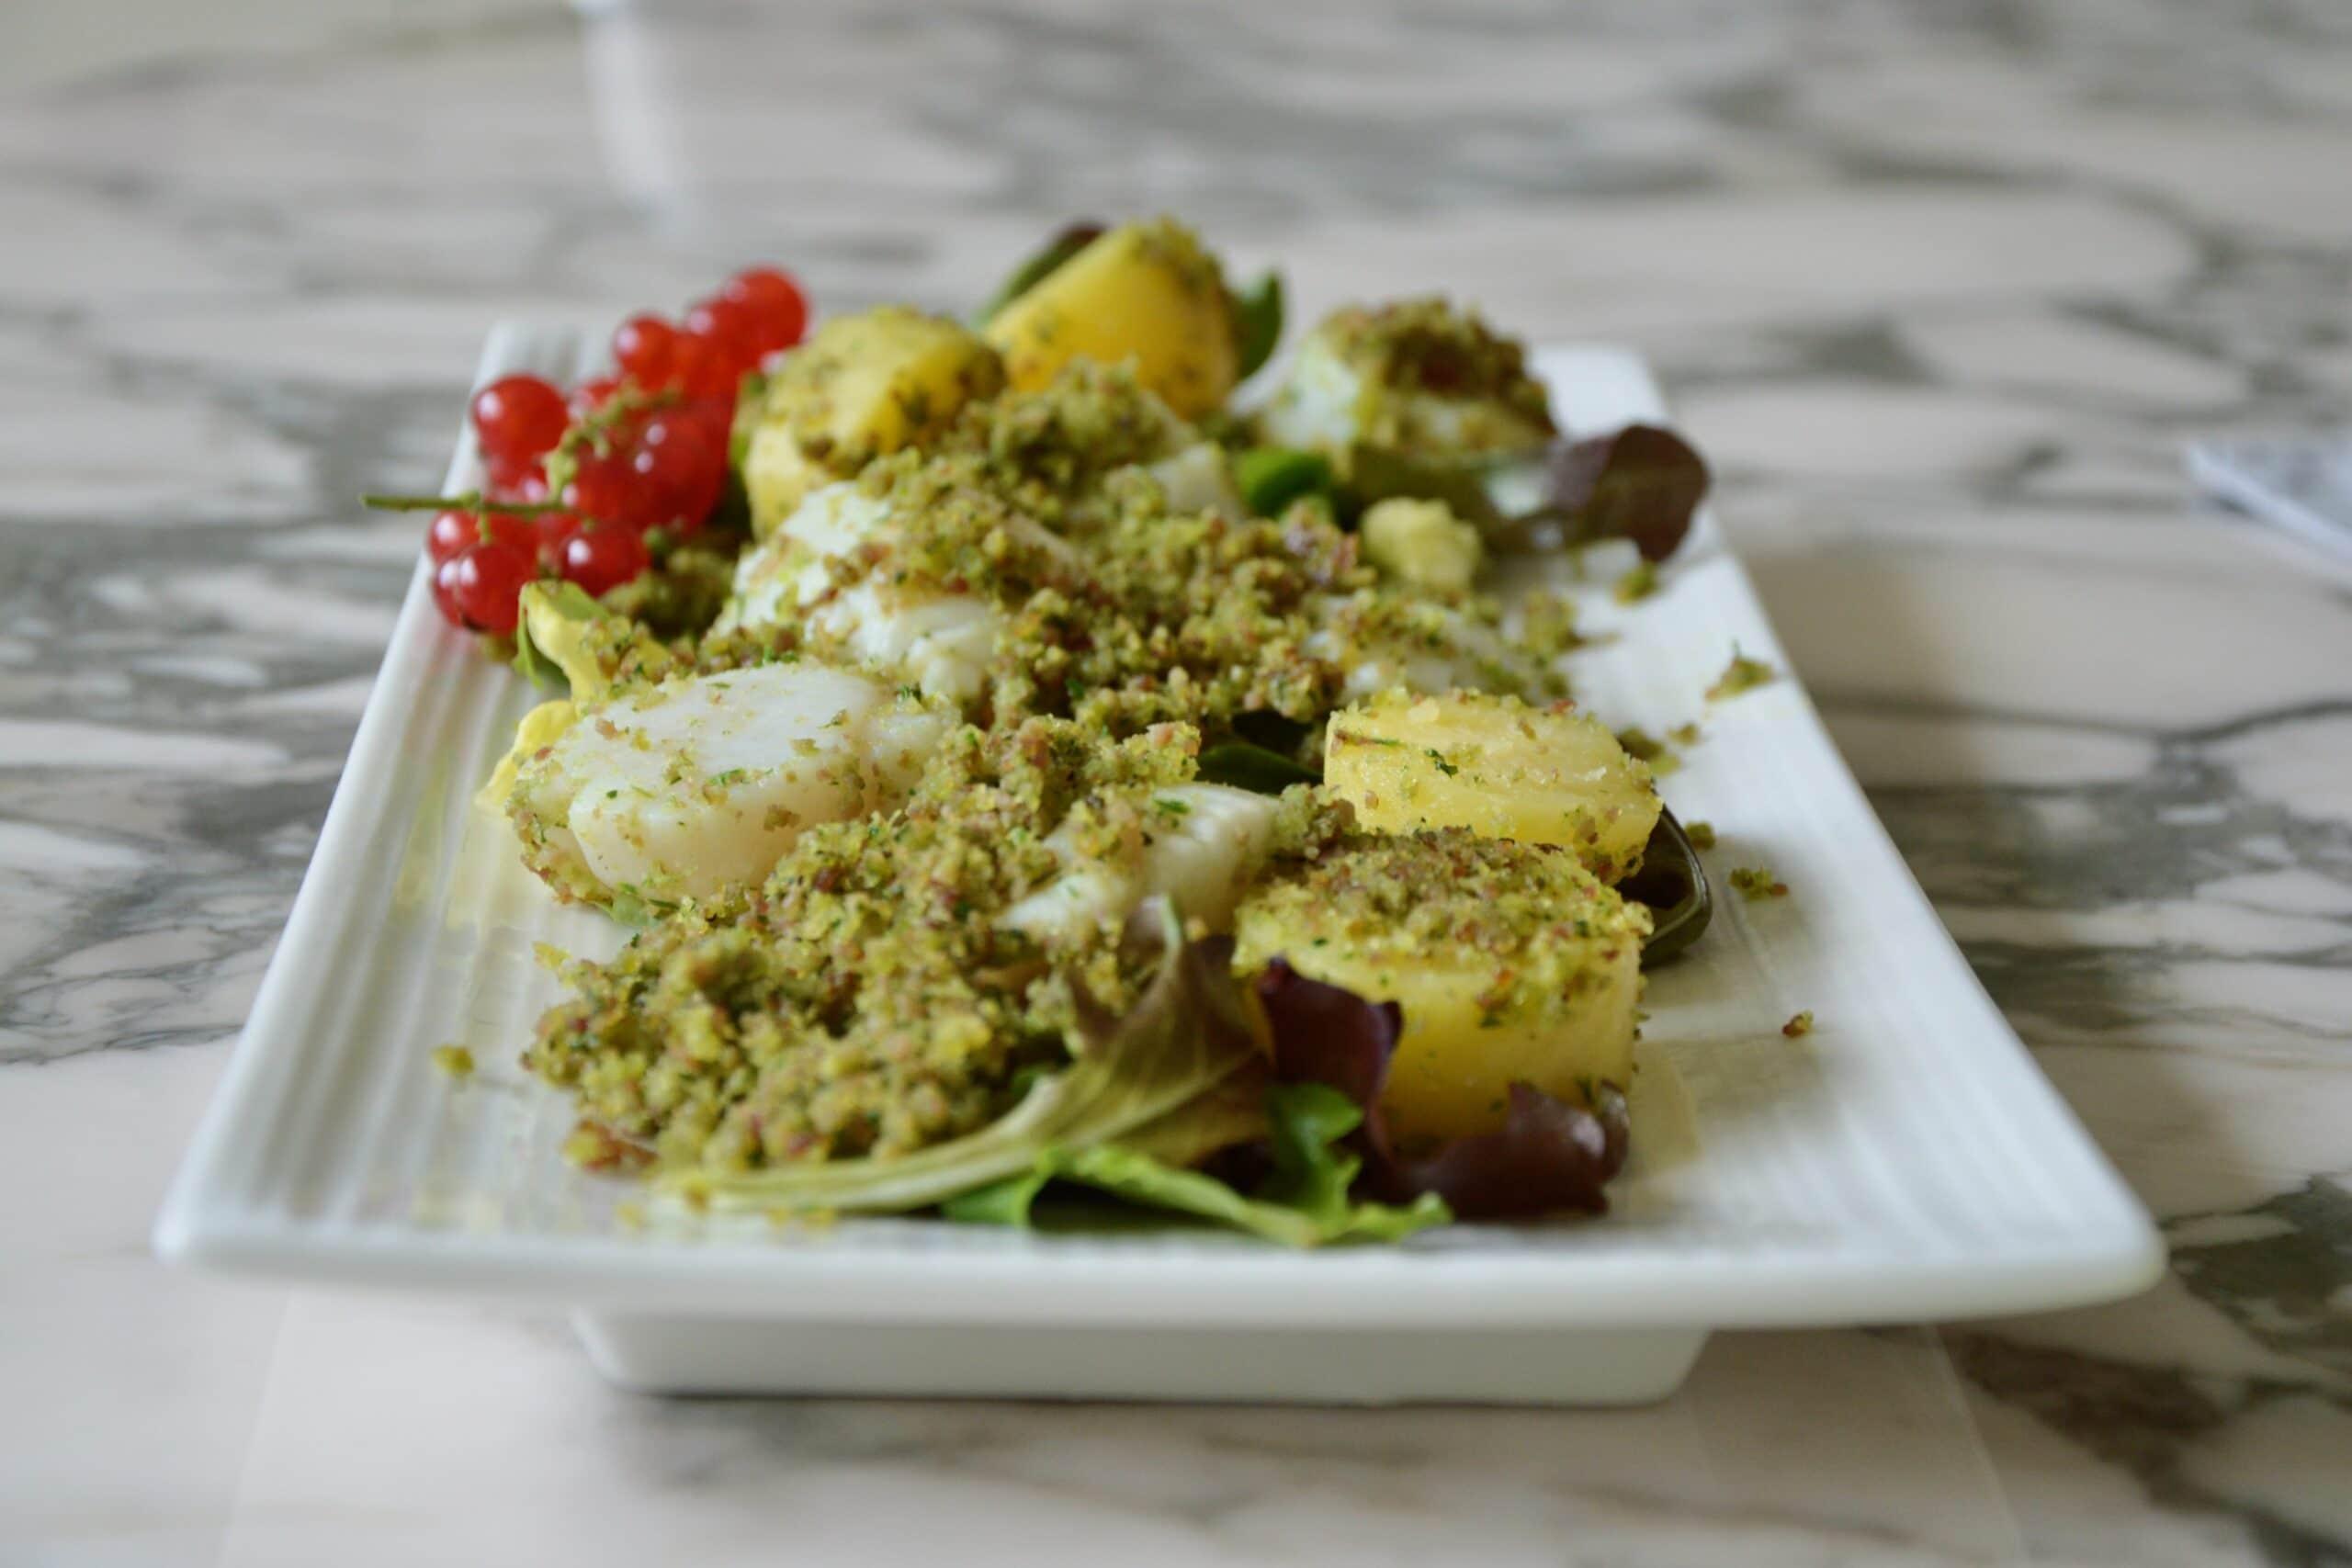 scallops with parma ham